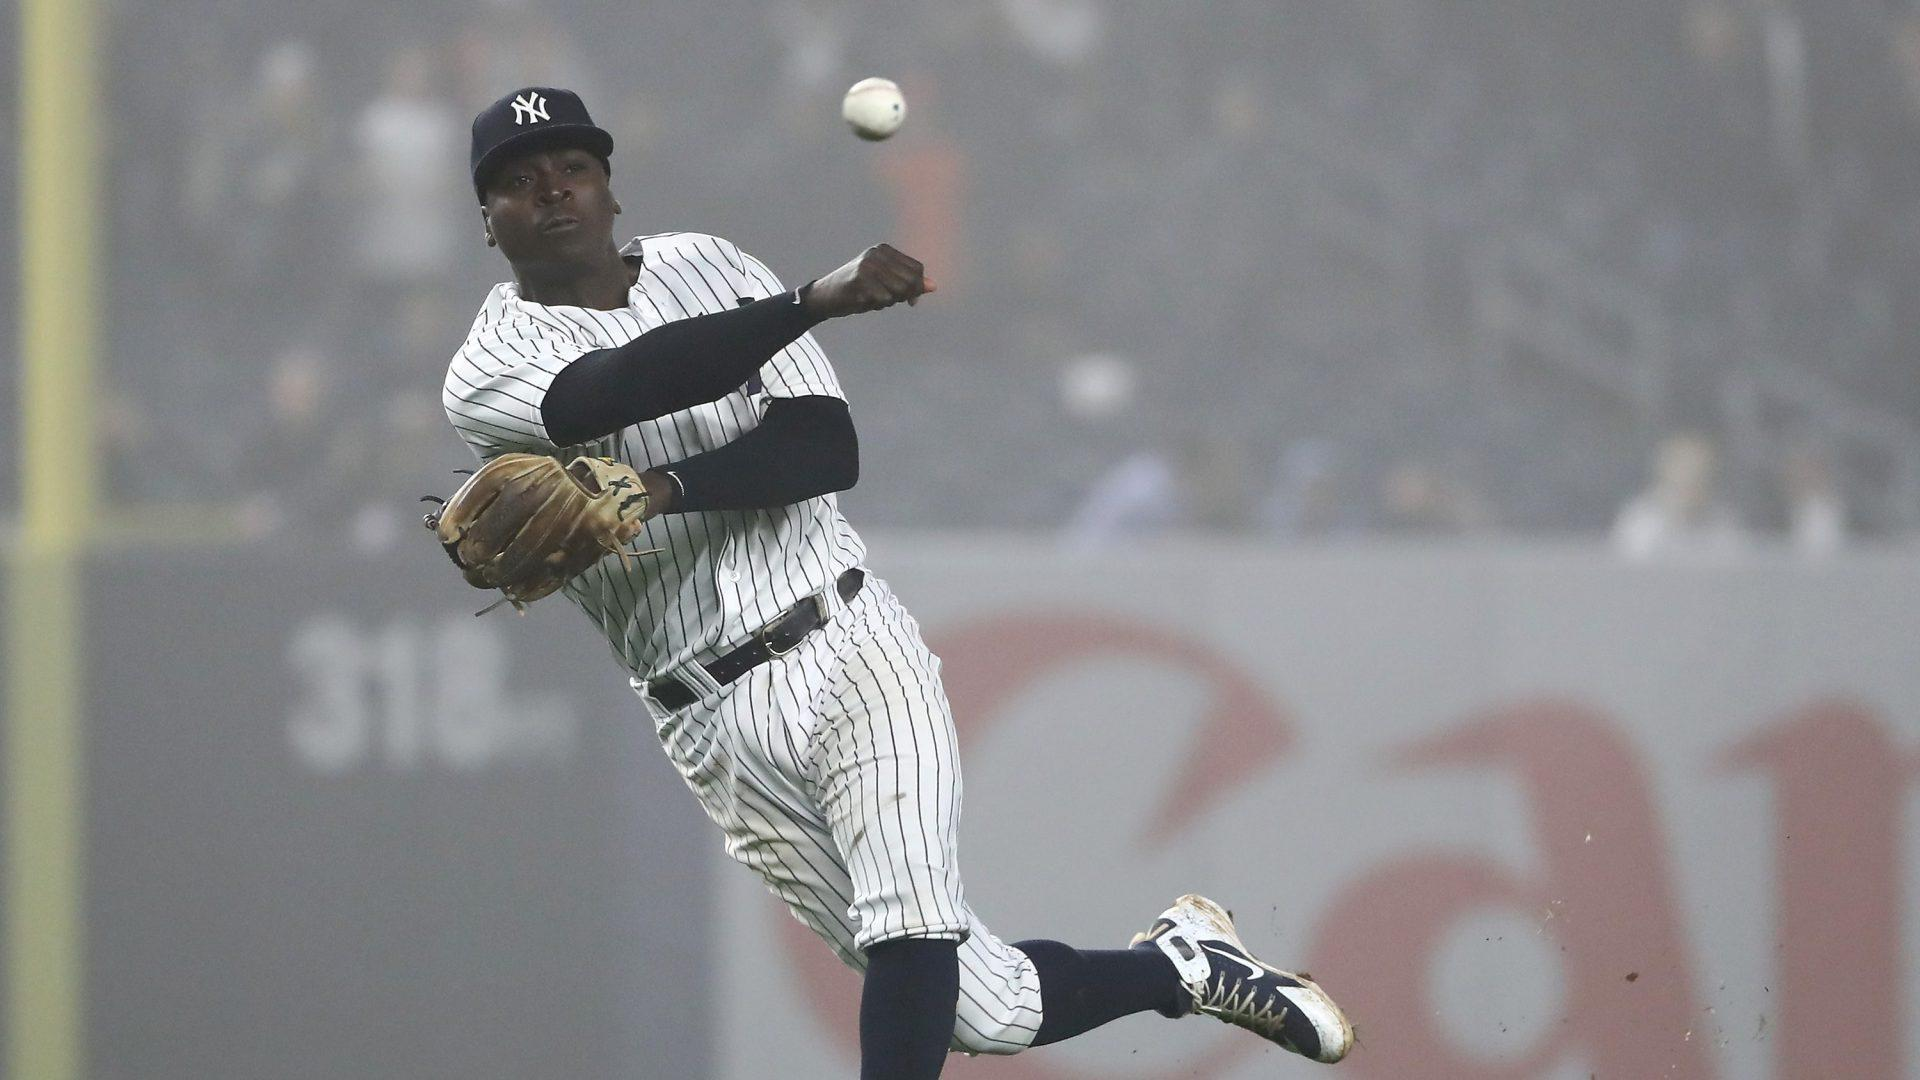 Report Didi Gregorius Cleared For Baseball Activities